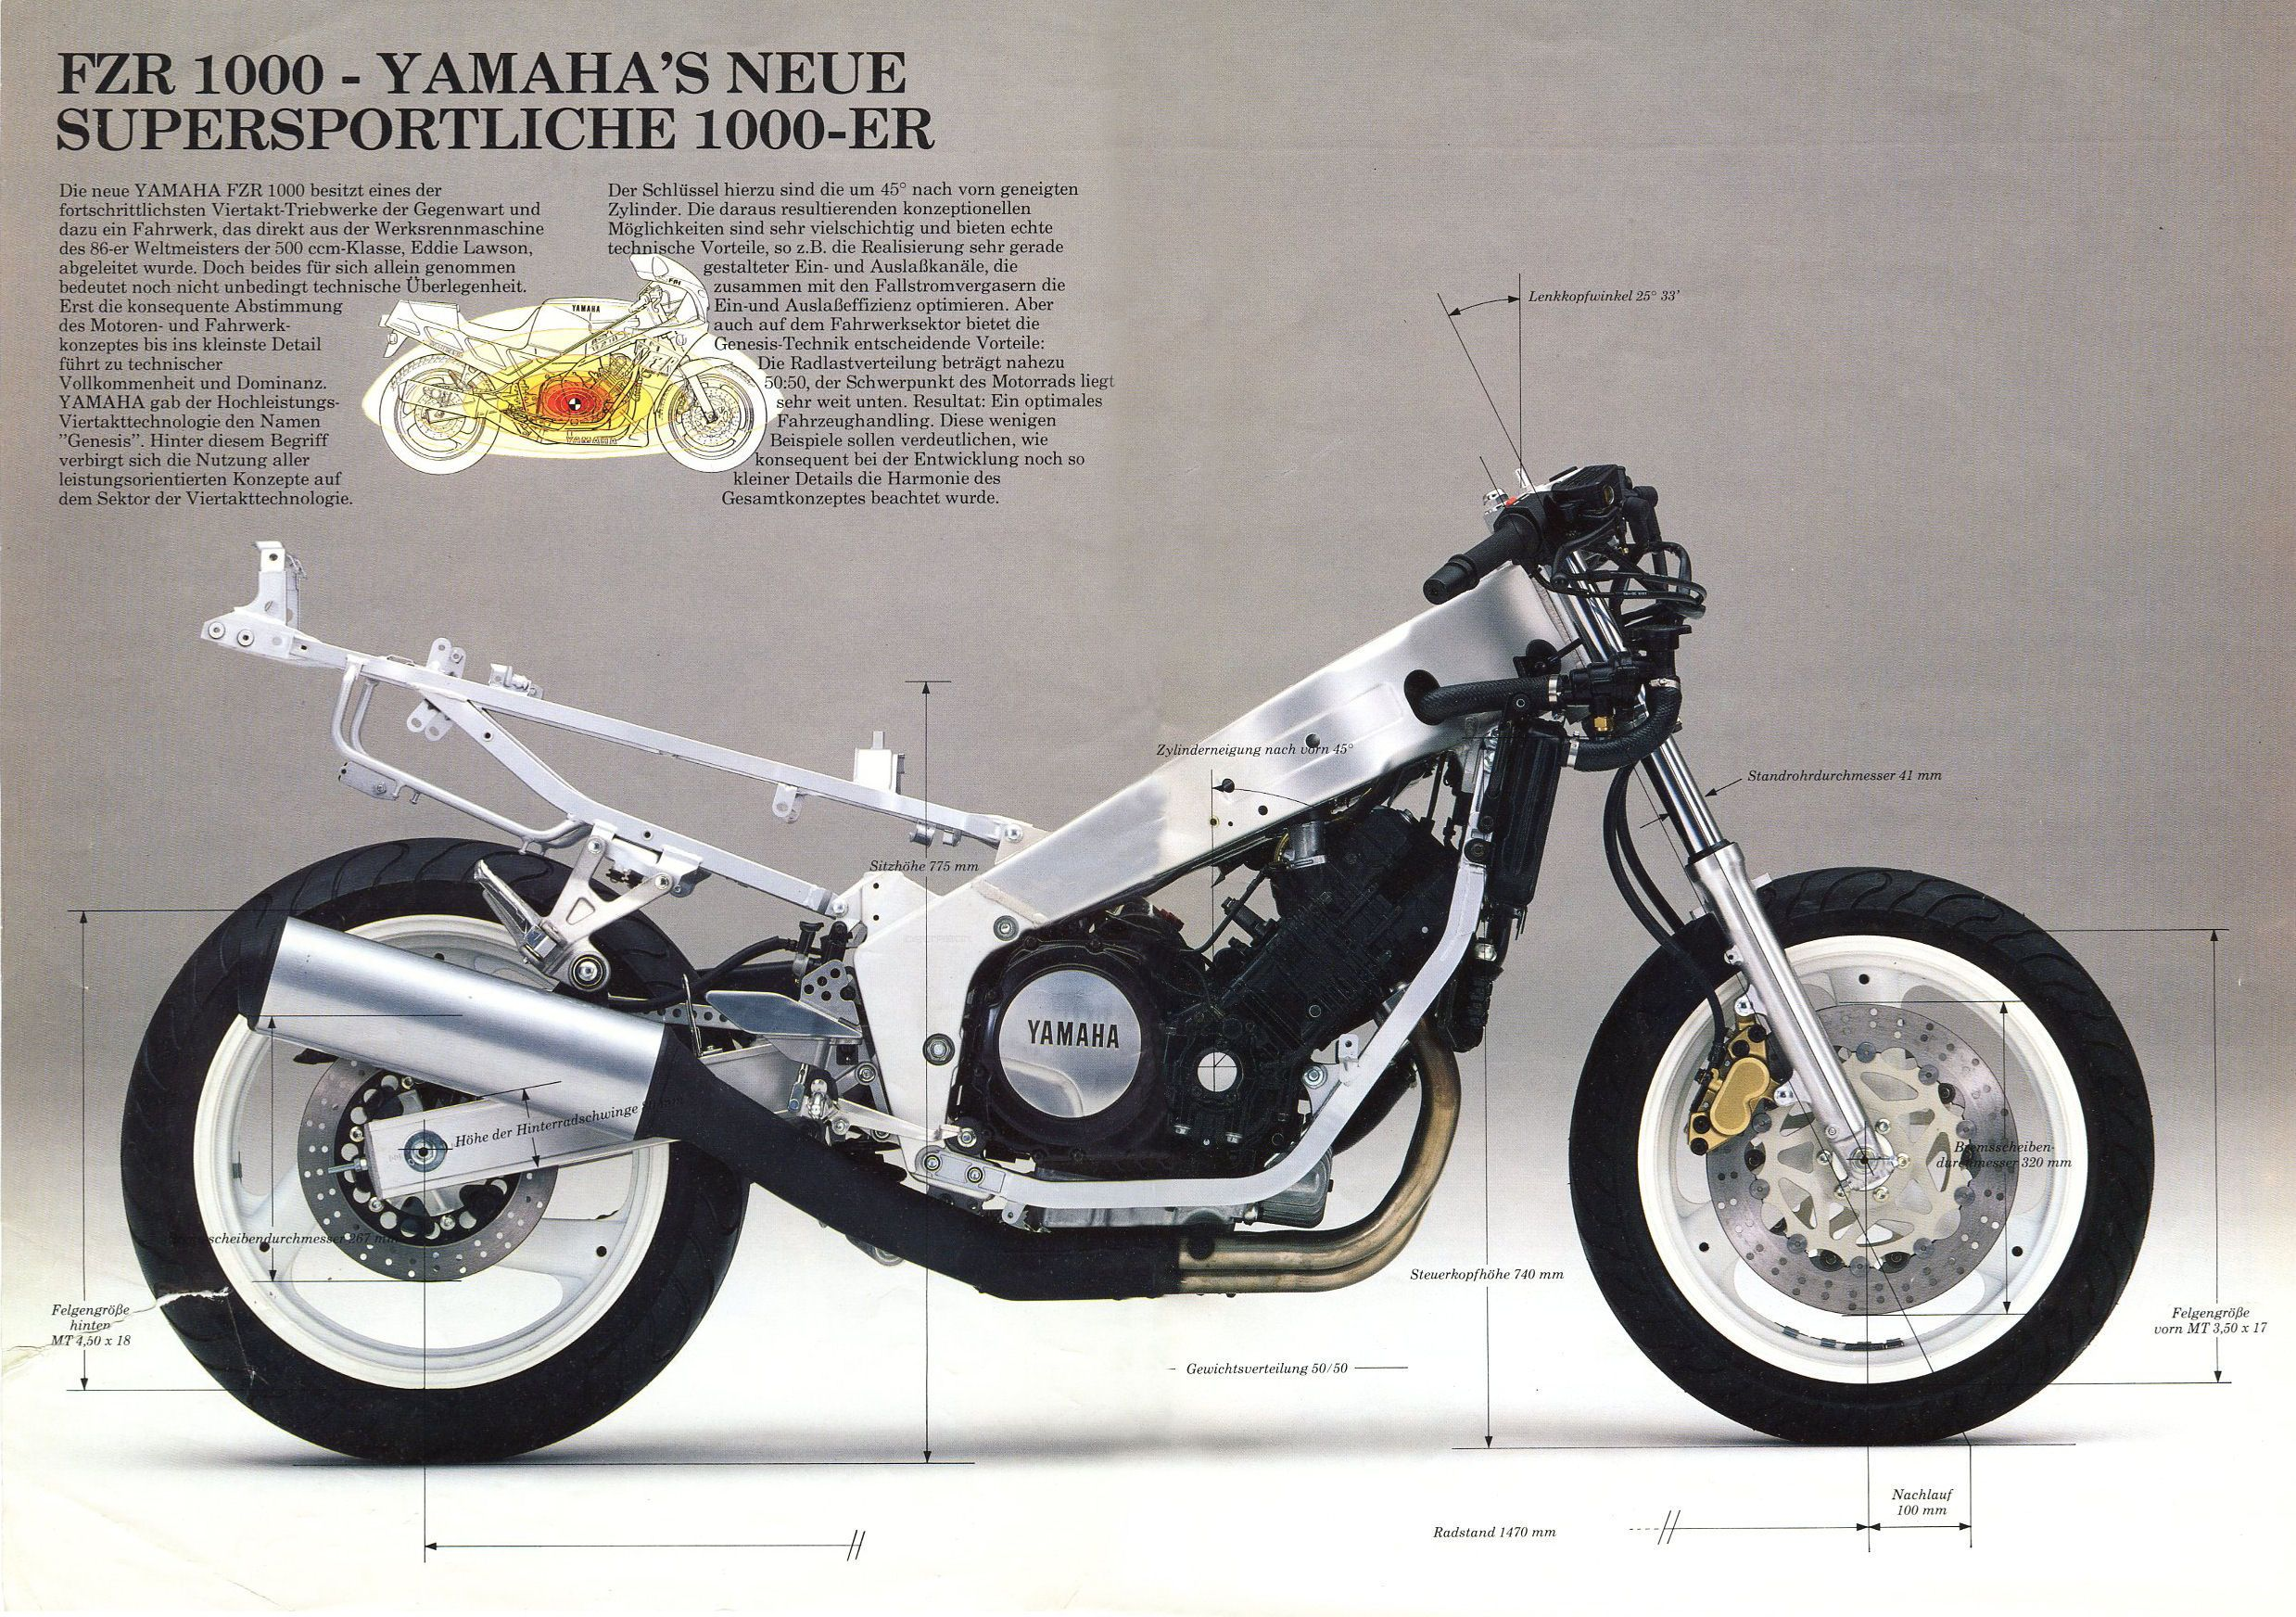 Yamaha Fzr 1000 manual Wirirng on